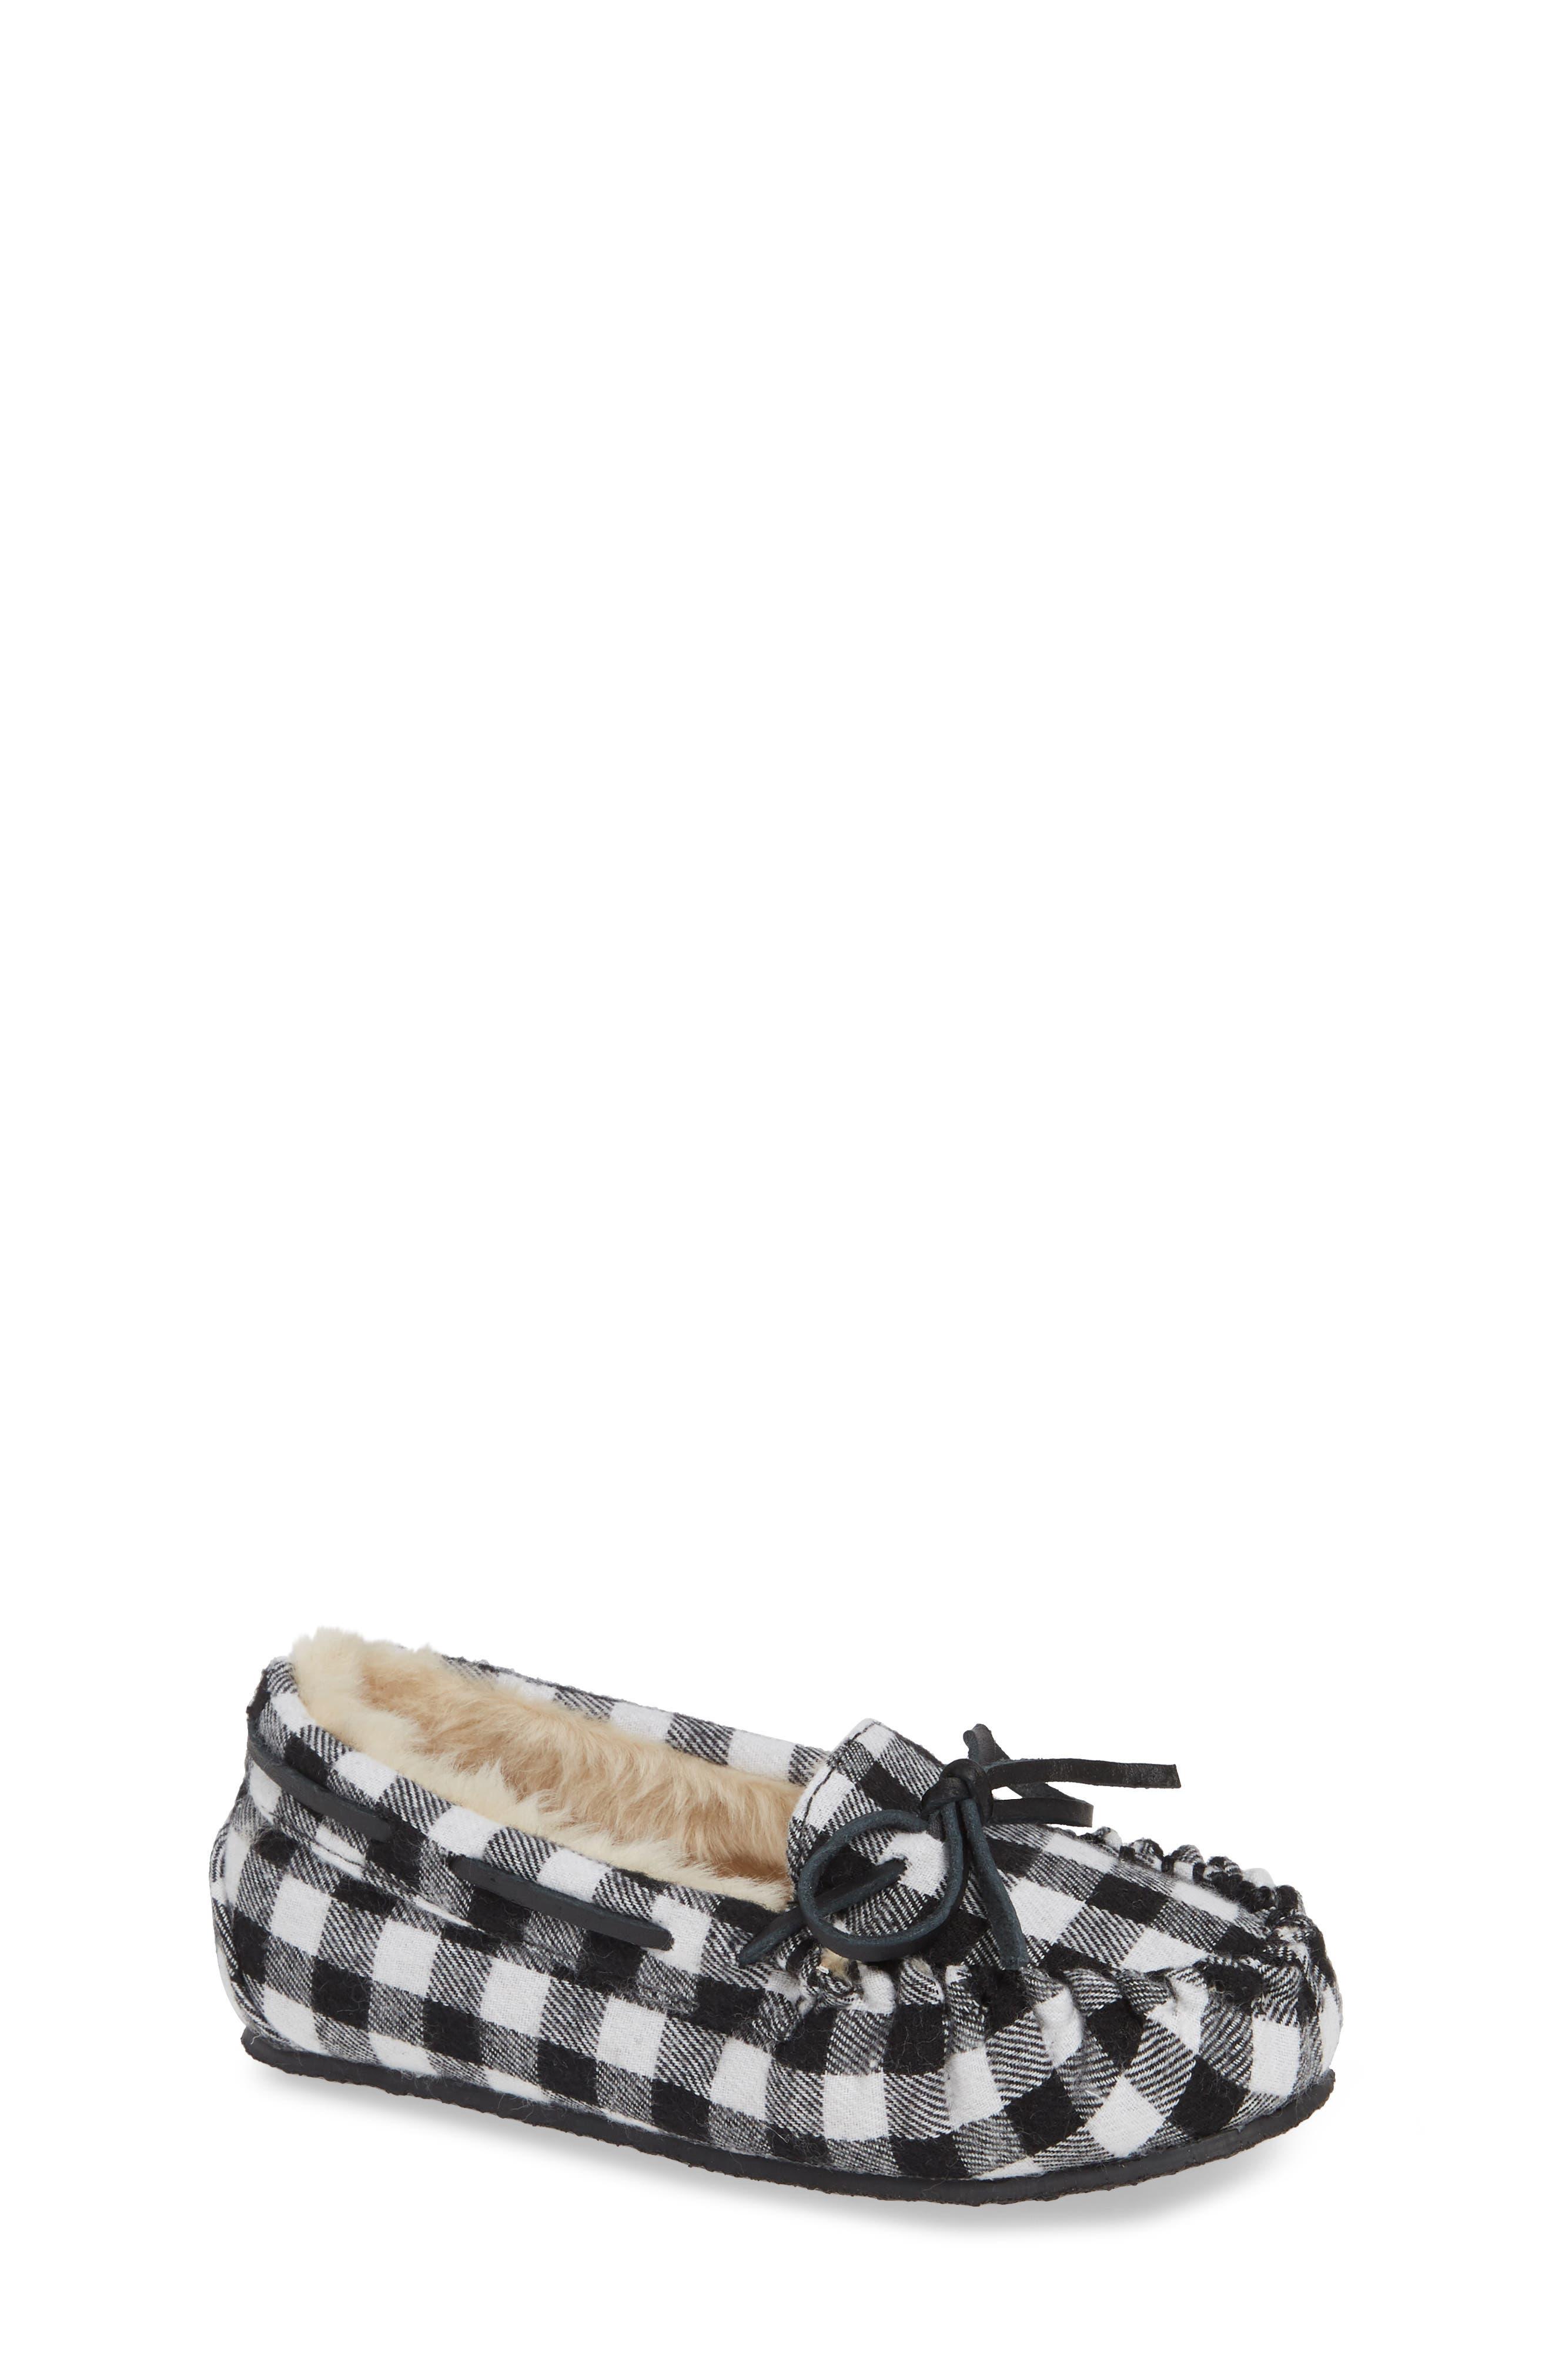 MINNETONKA 'Cassie' Slipper, Main, color, BLACK PLAID